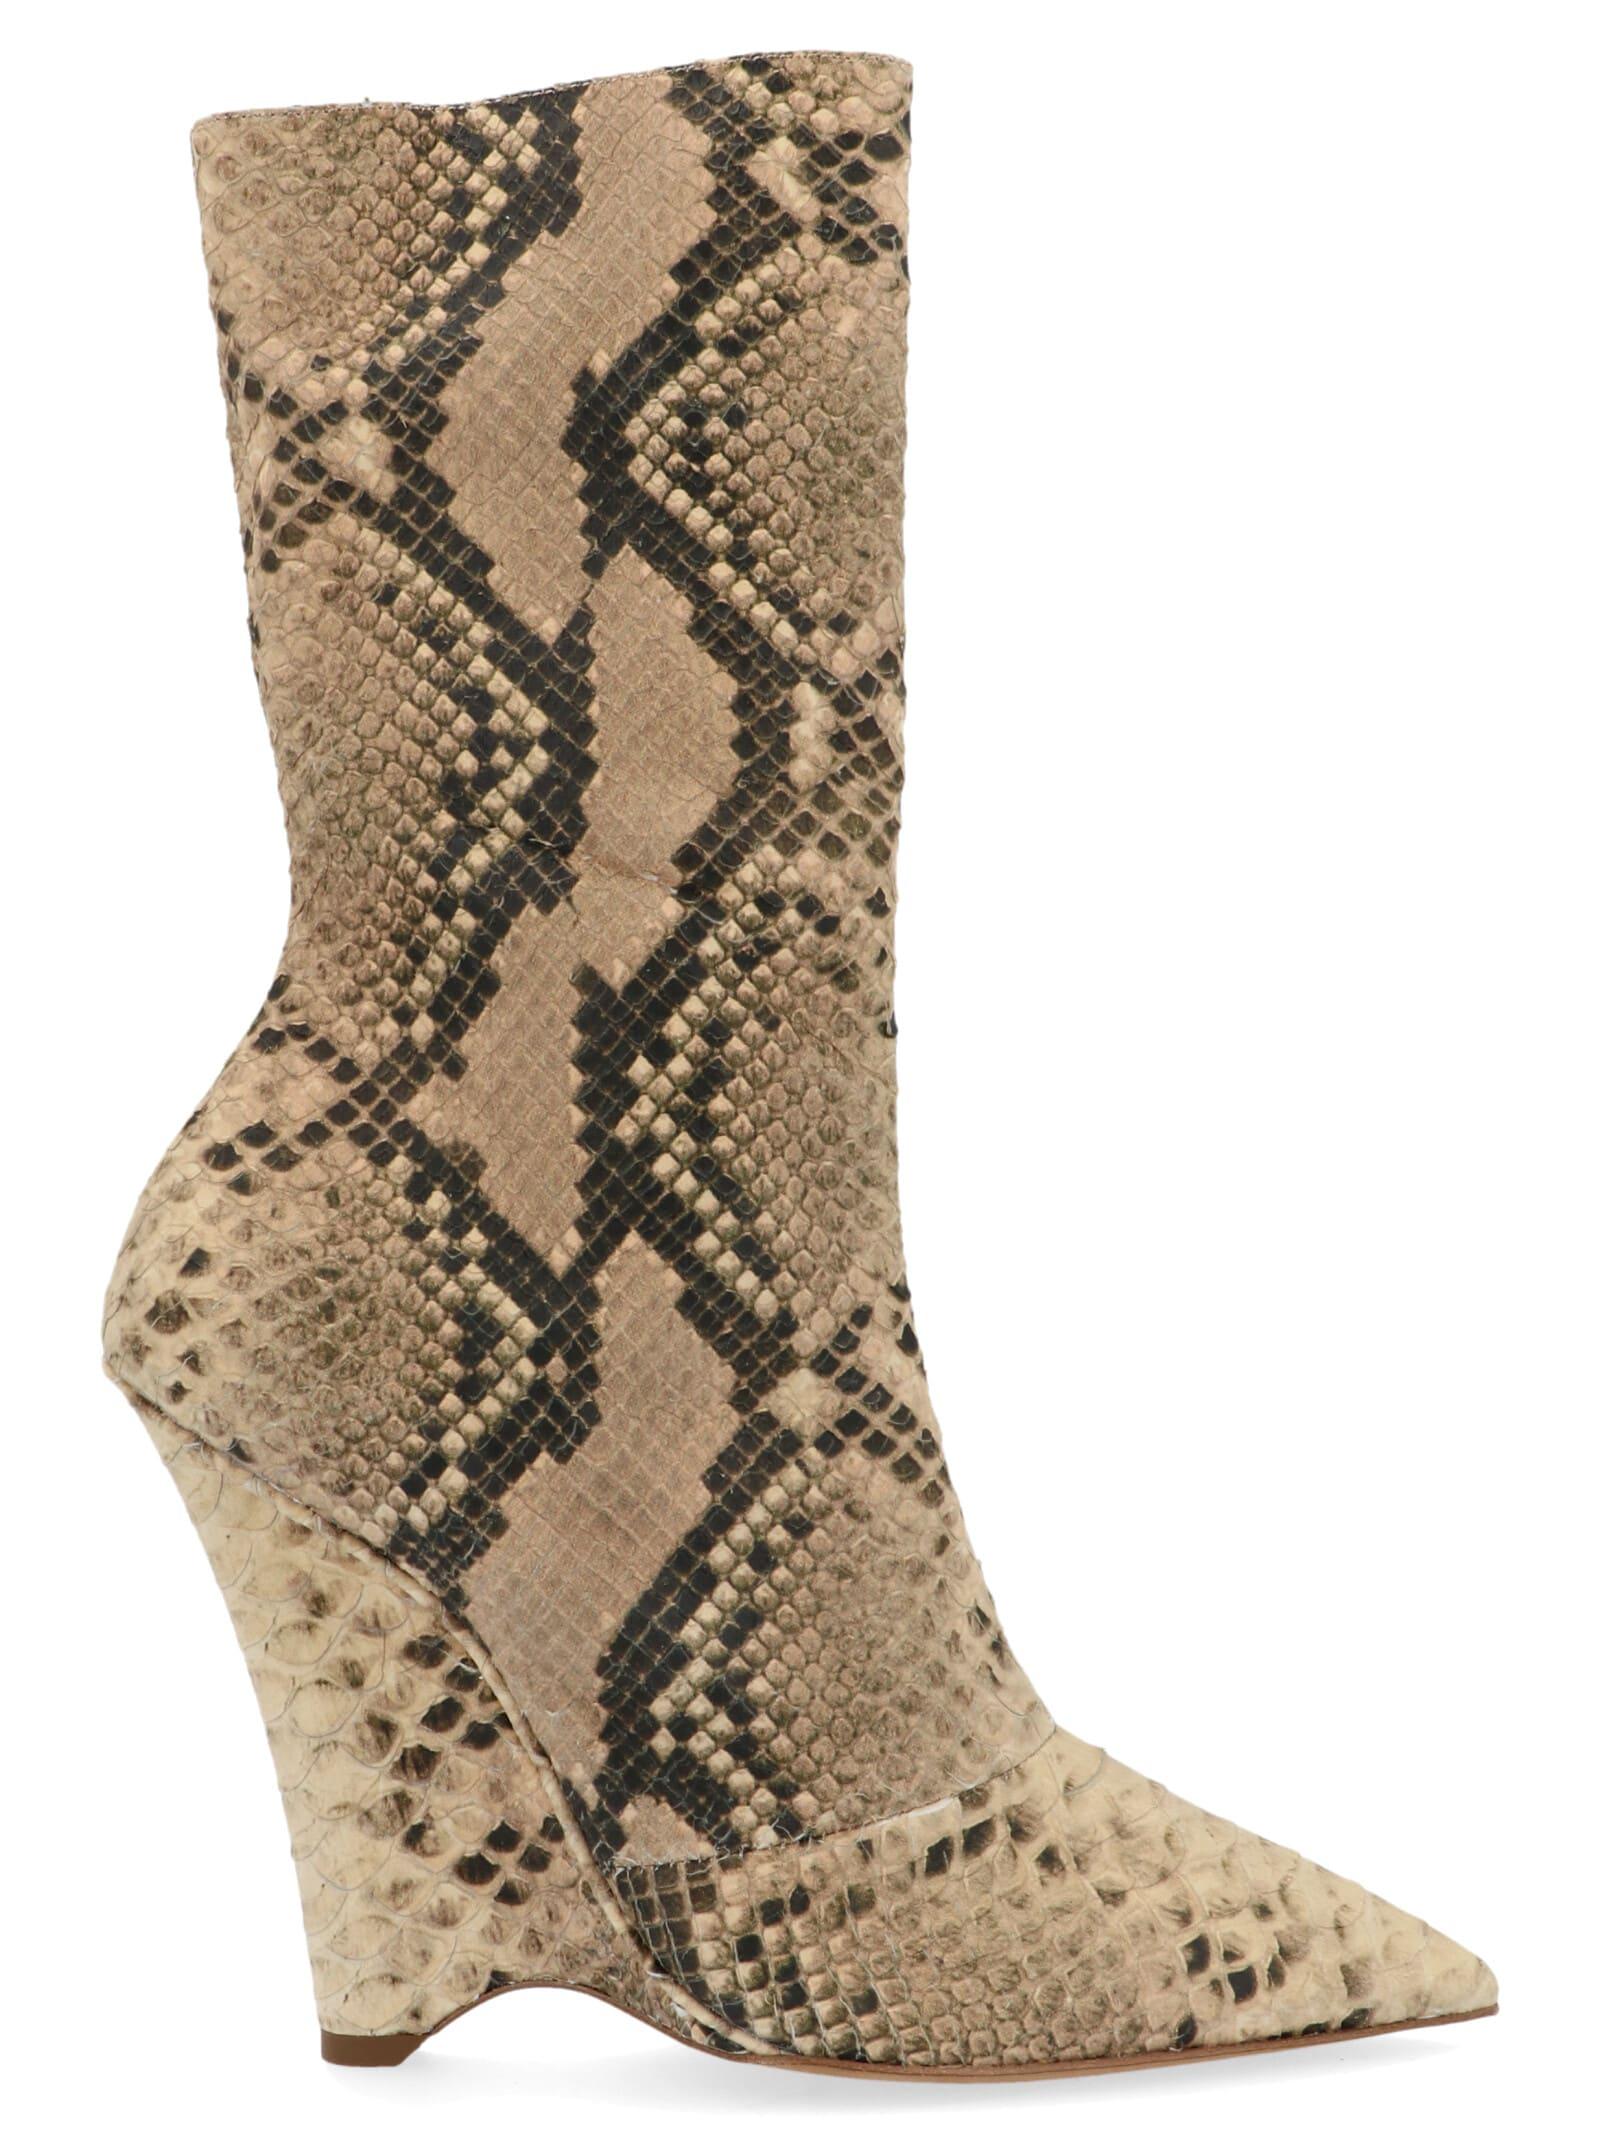 Shop \u003e yeezy boots sale- Off 73